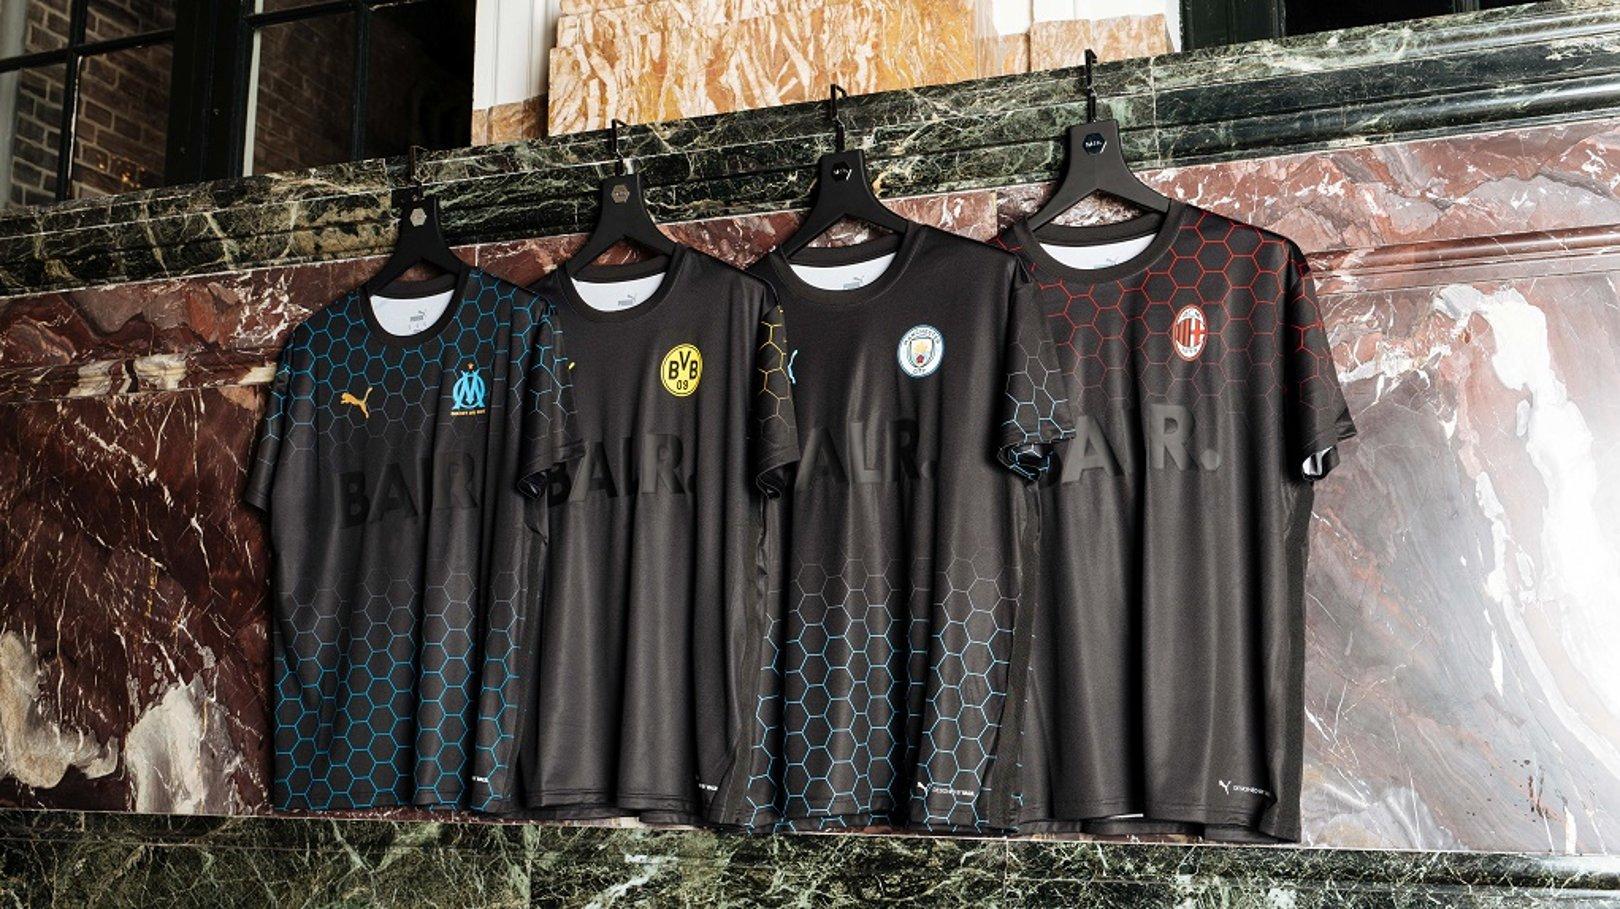 PUMA launch new X CITY X BALR jersey